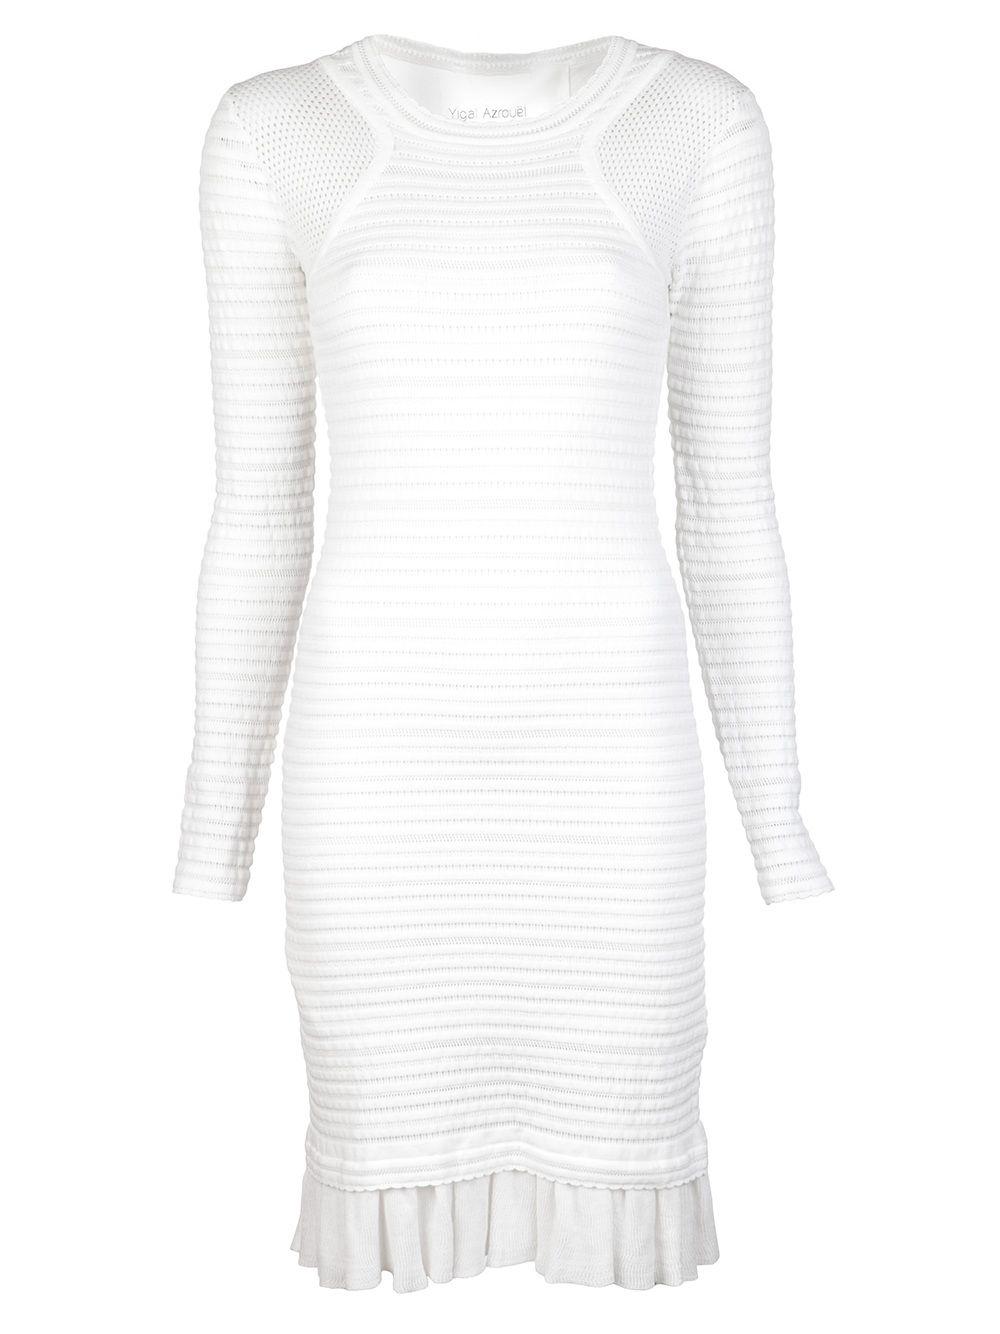 Park Art|My WordPress Blog_White Knit Dress Long Sleeve